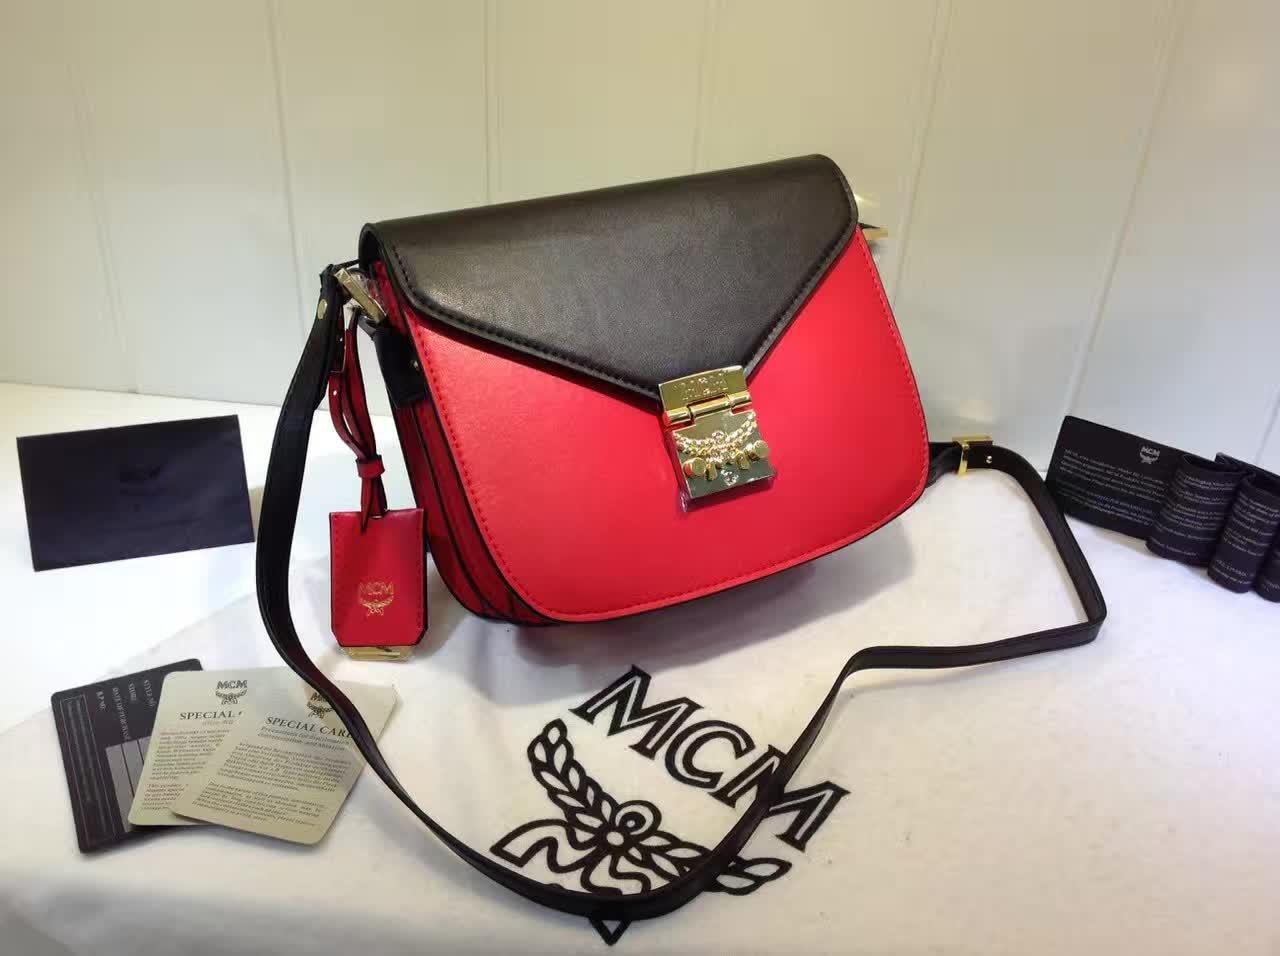 MCM官网 Patricia系列邮差包 外观简约时尚 翻绒内里 实用多隔层 黑红